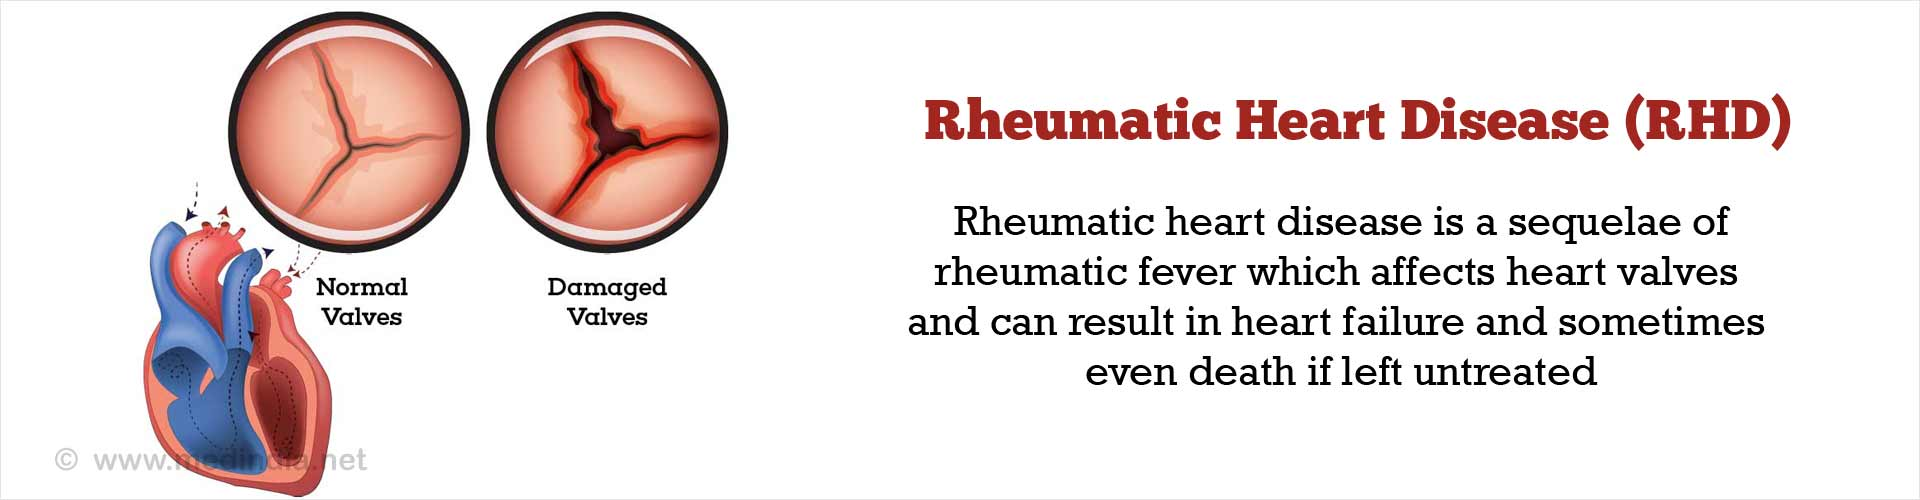 Rheumatic Heart Disease (RHD)